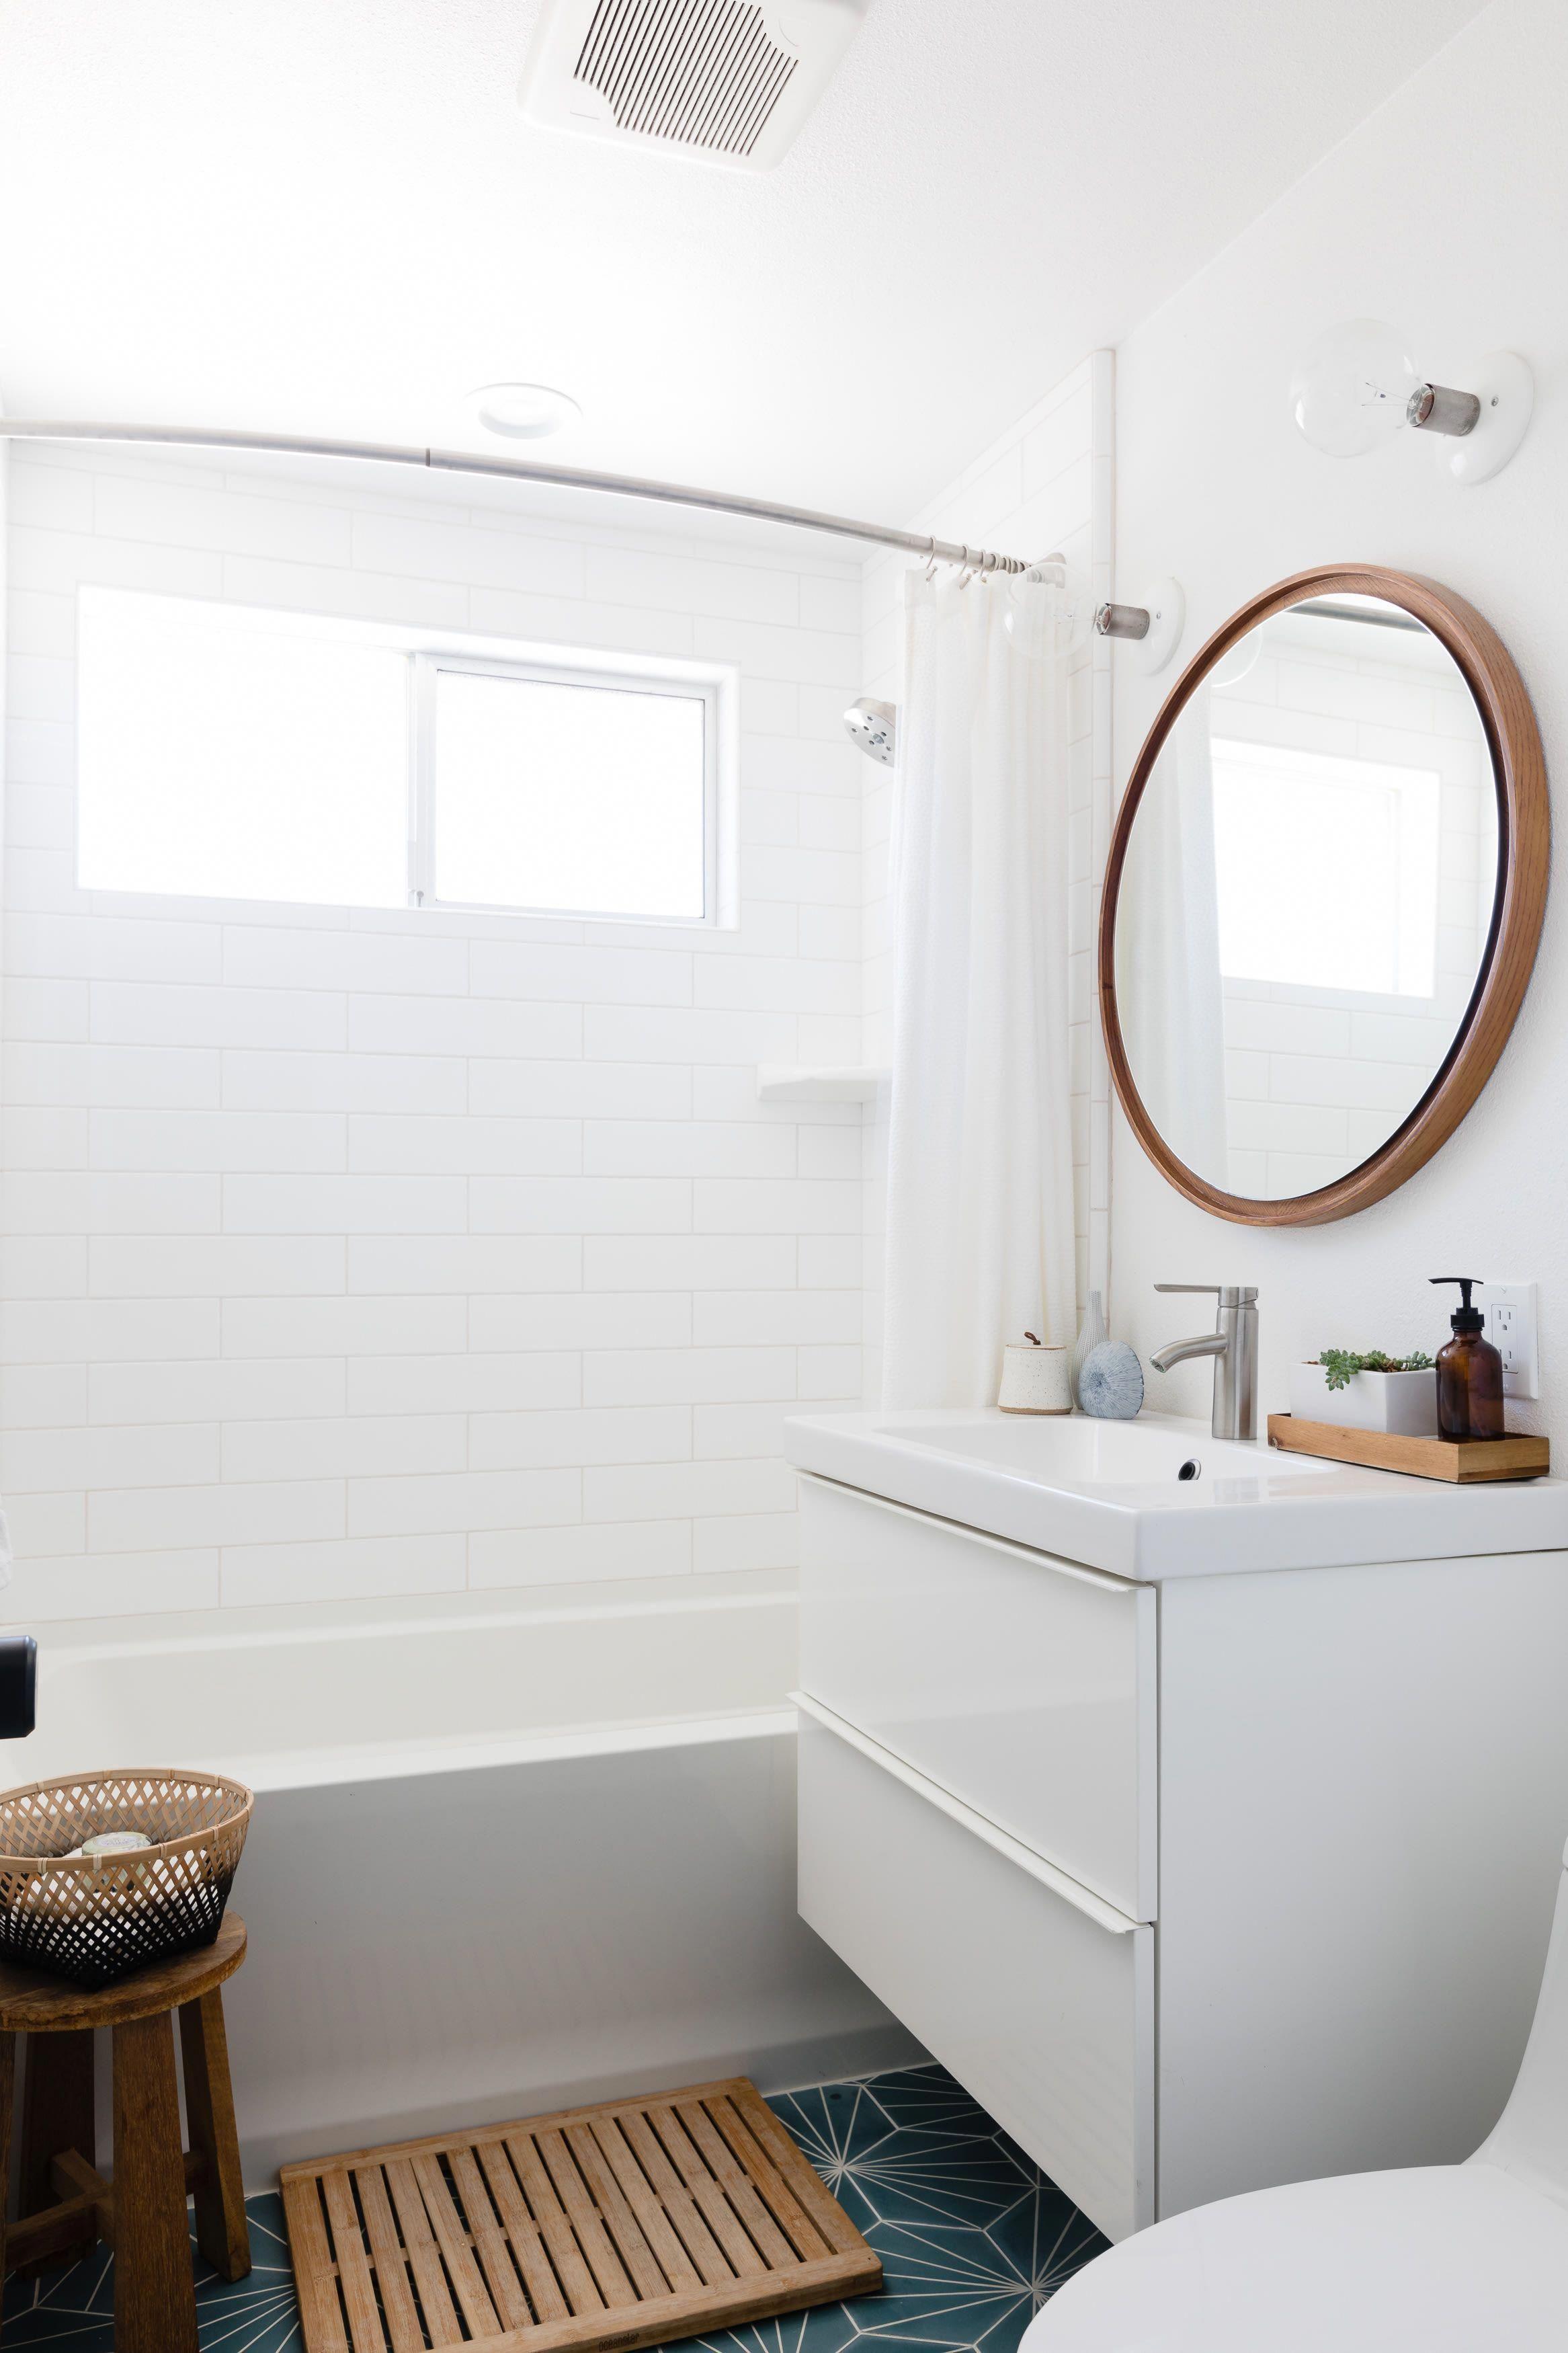 The Guest Bathroom Tile Is Marrakech Design S Dandelion Pattern